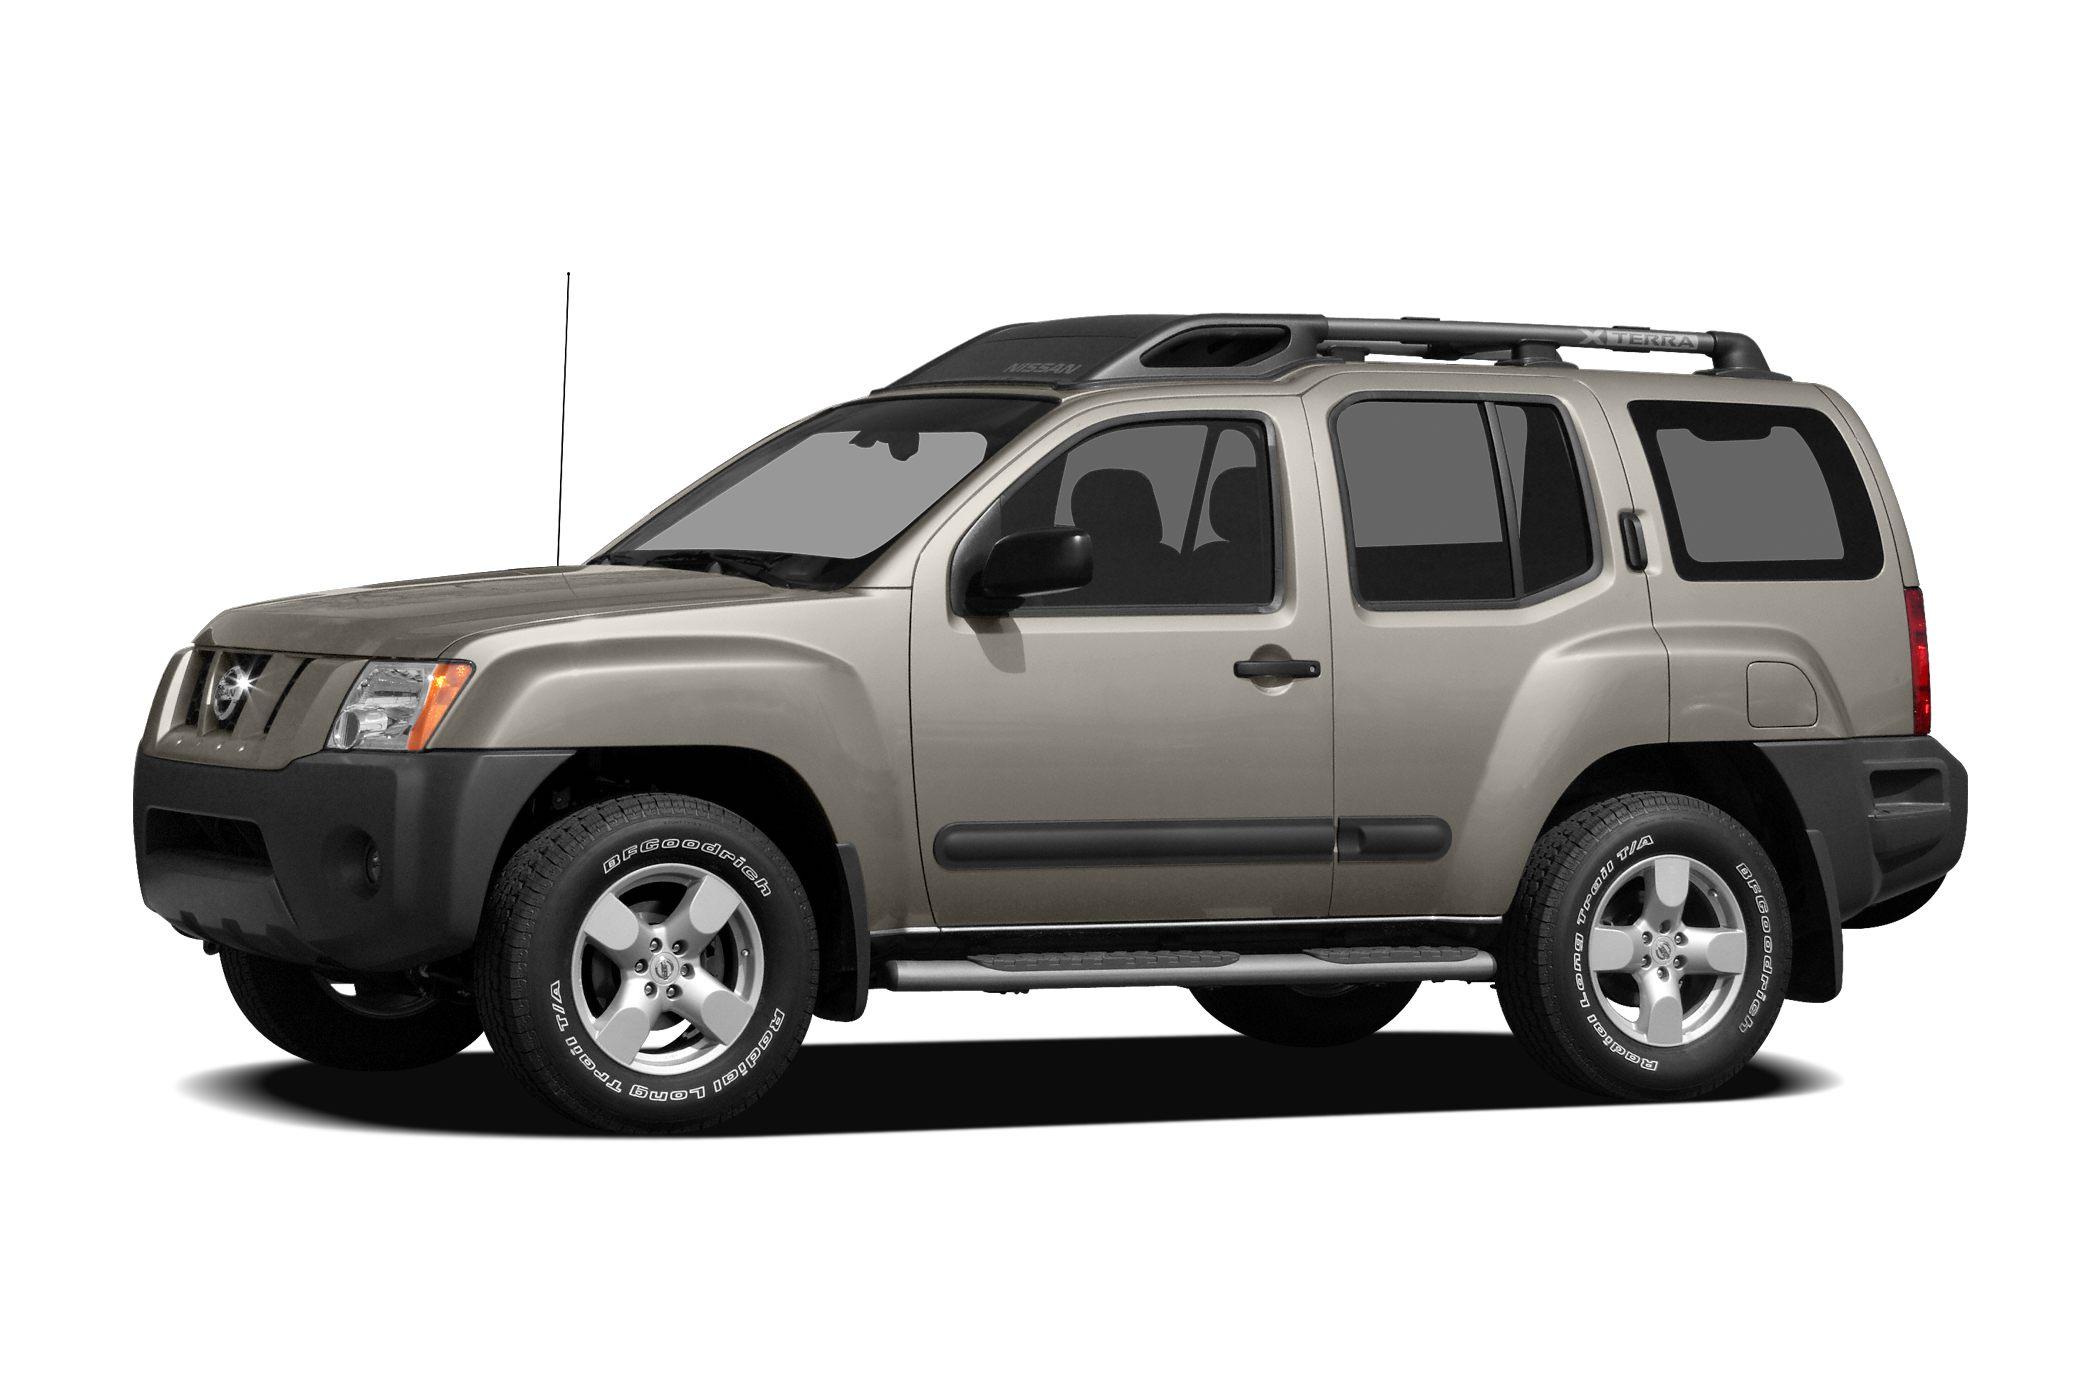 2007 Nissan Xterra  Miles 93310Color Gray Stock 16627 VIN 5N1AN08W17C514281